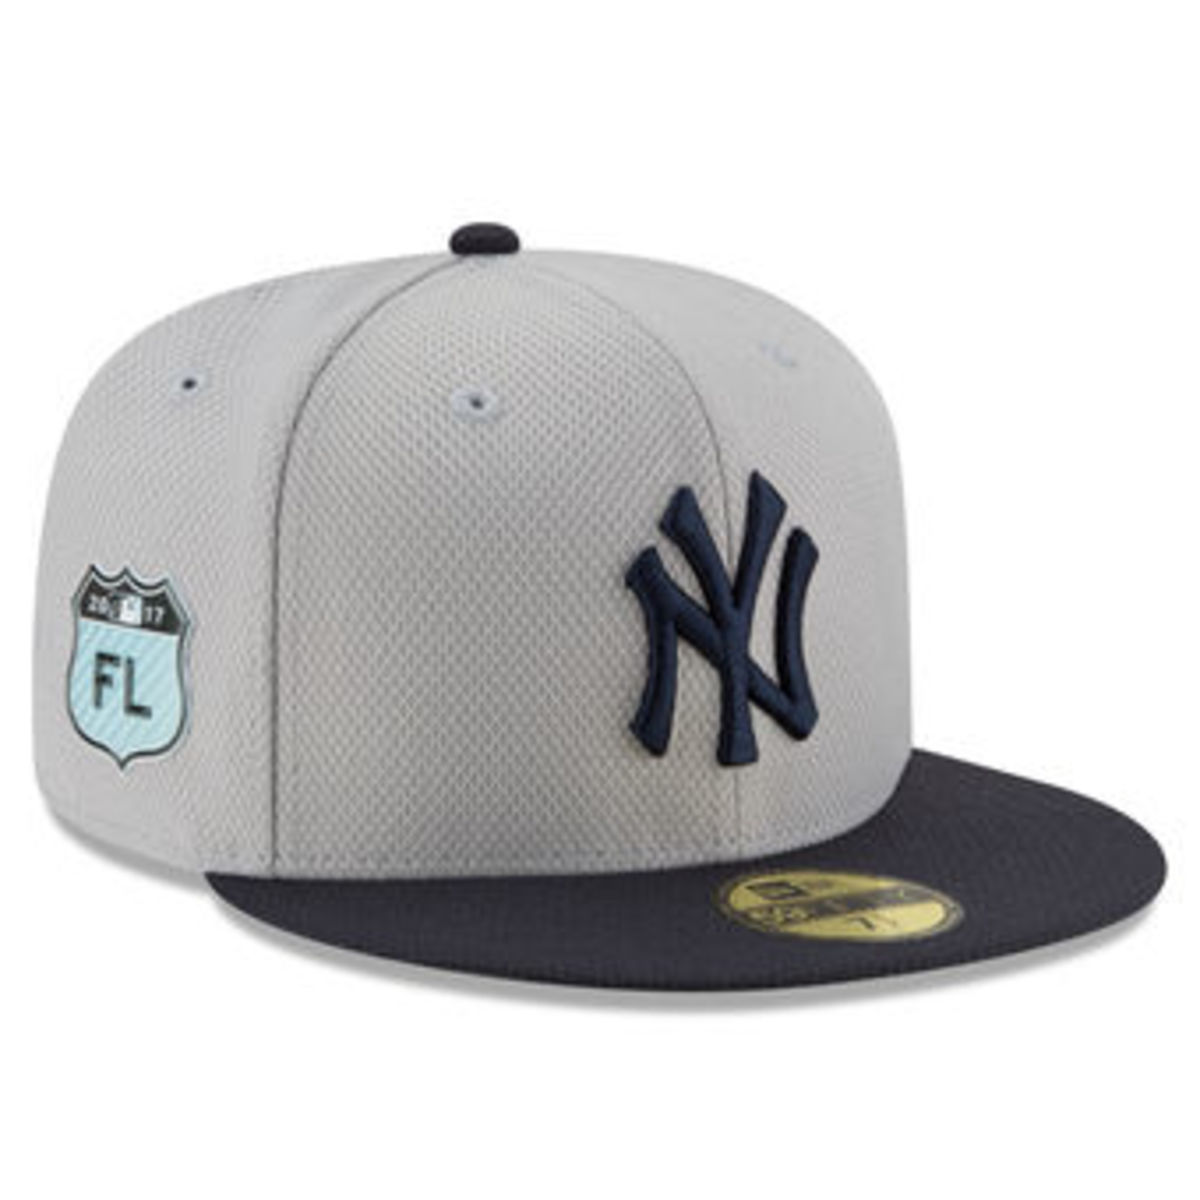 yankees-spring-training-hat-1.jpg